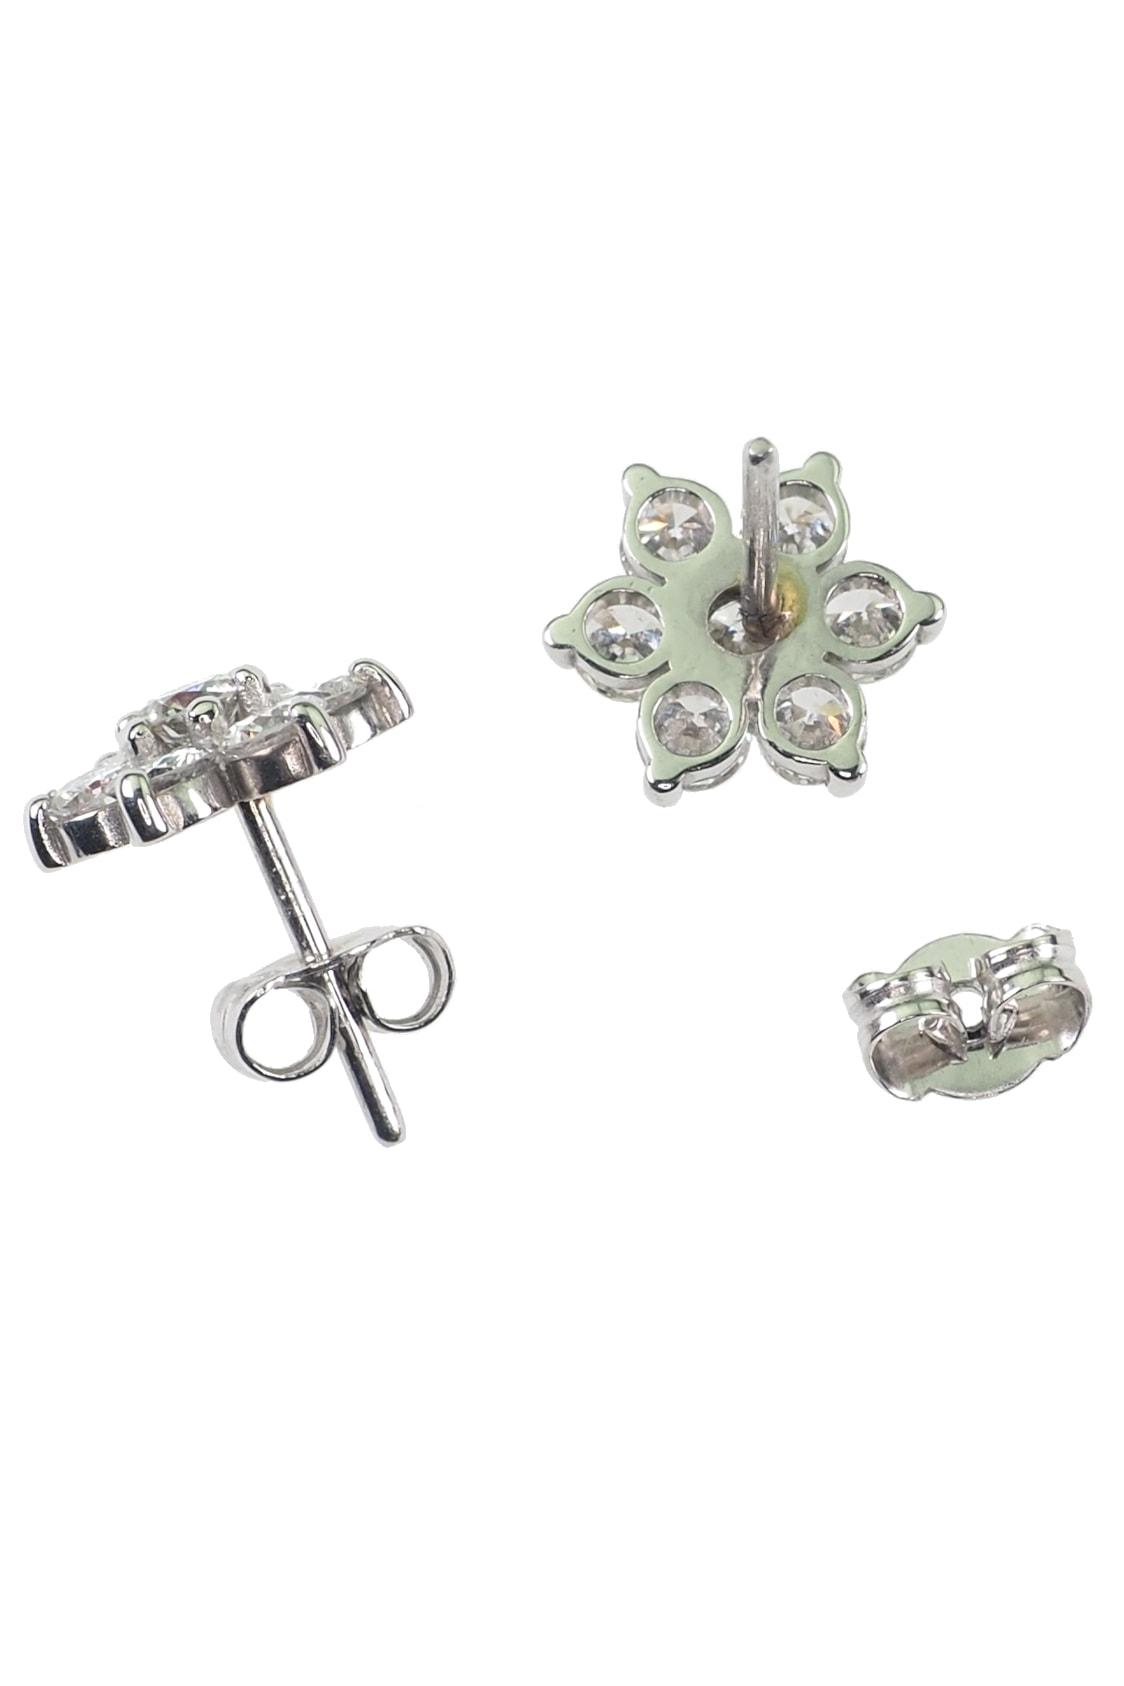 zertifizierter-Diamantschmuck-0281c